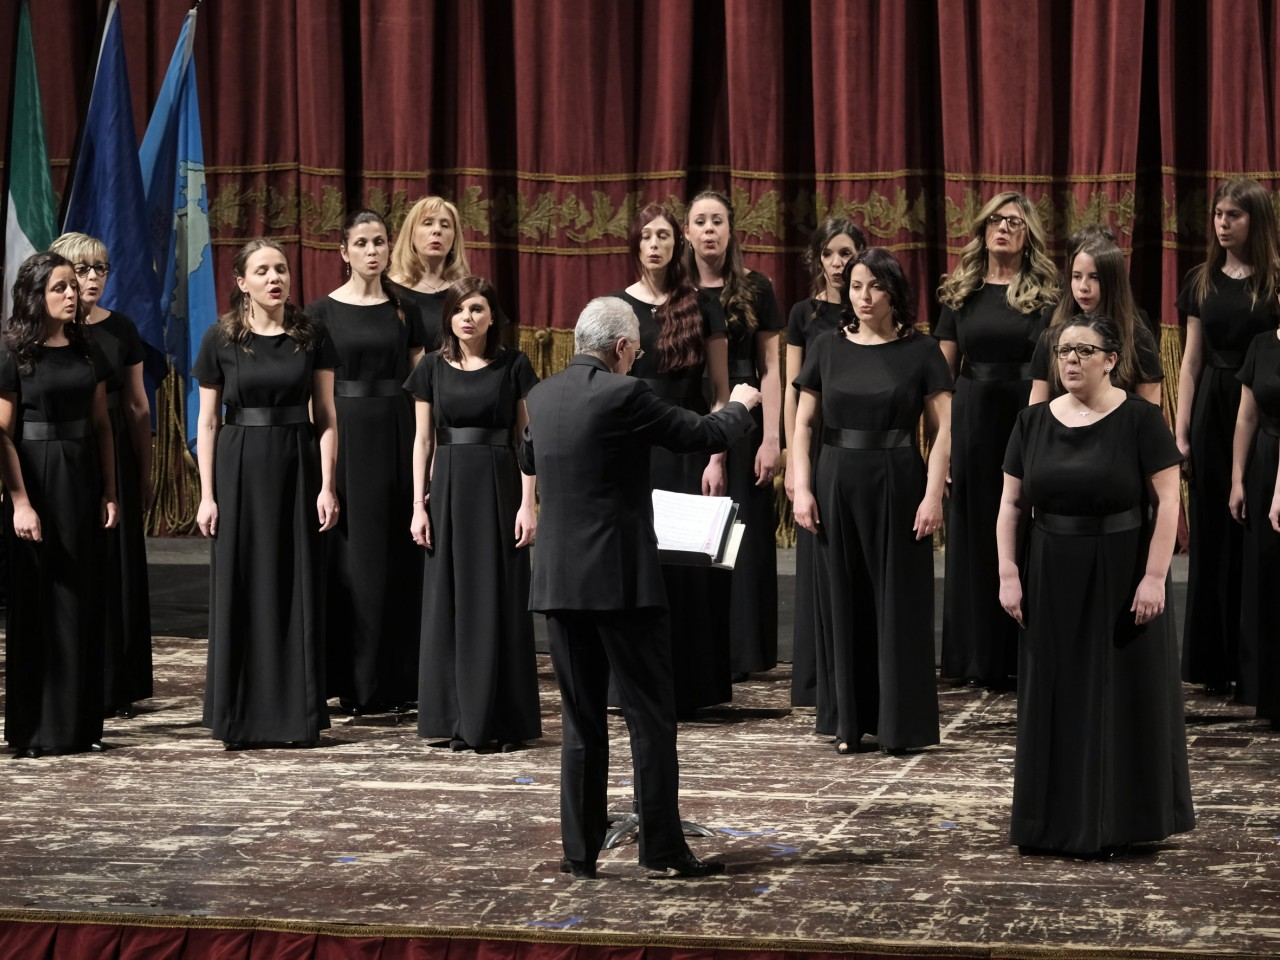 Verona Choir Competition